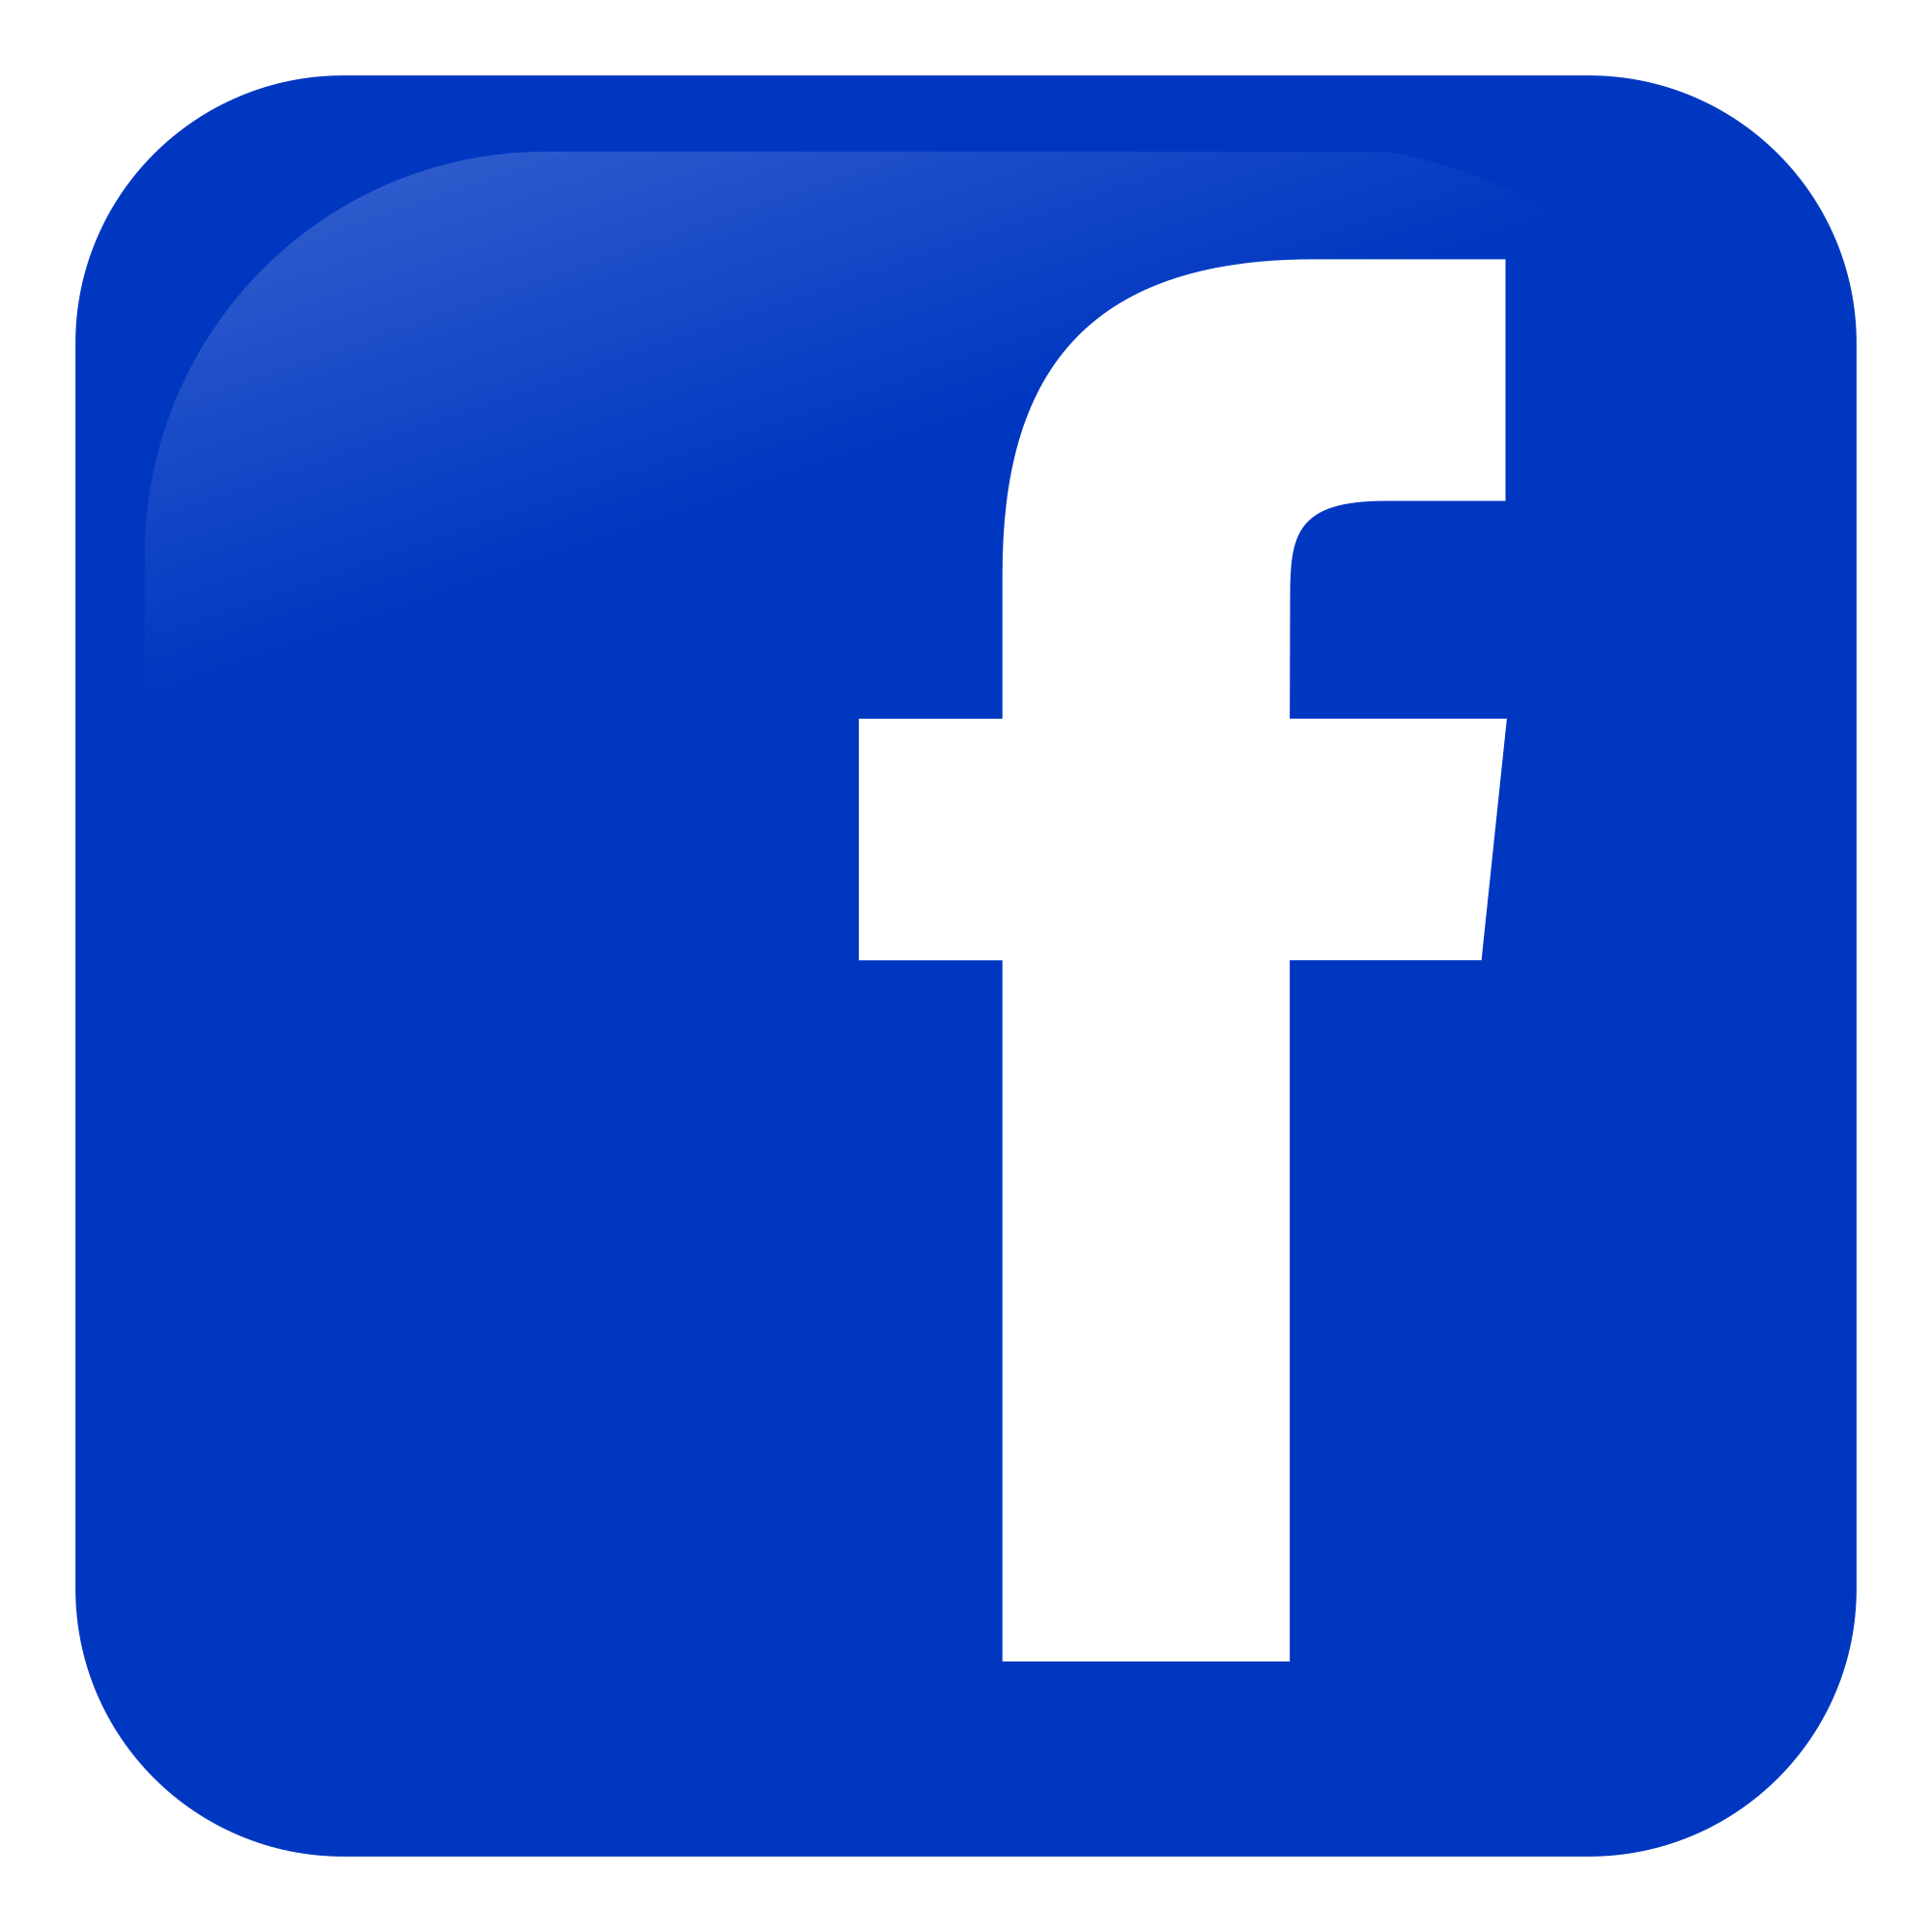 Contacto_facebook